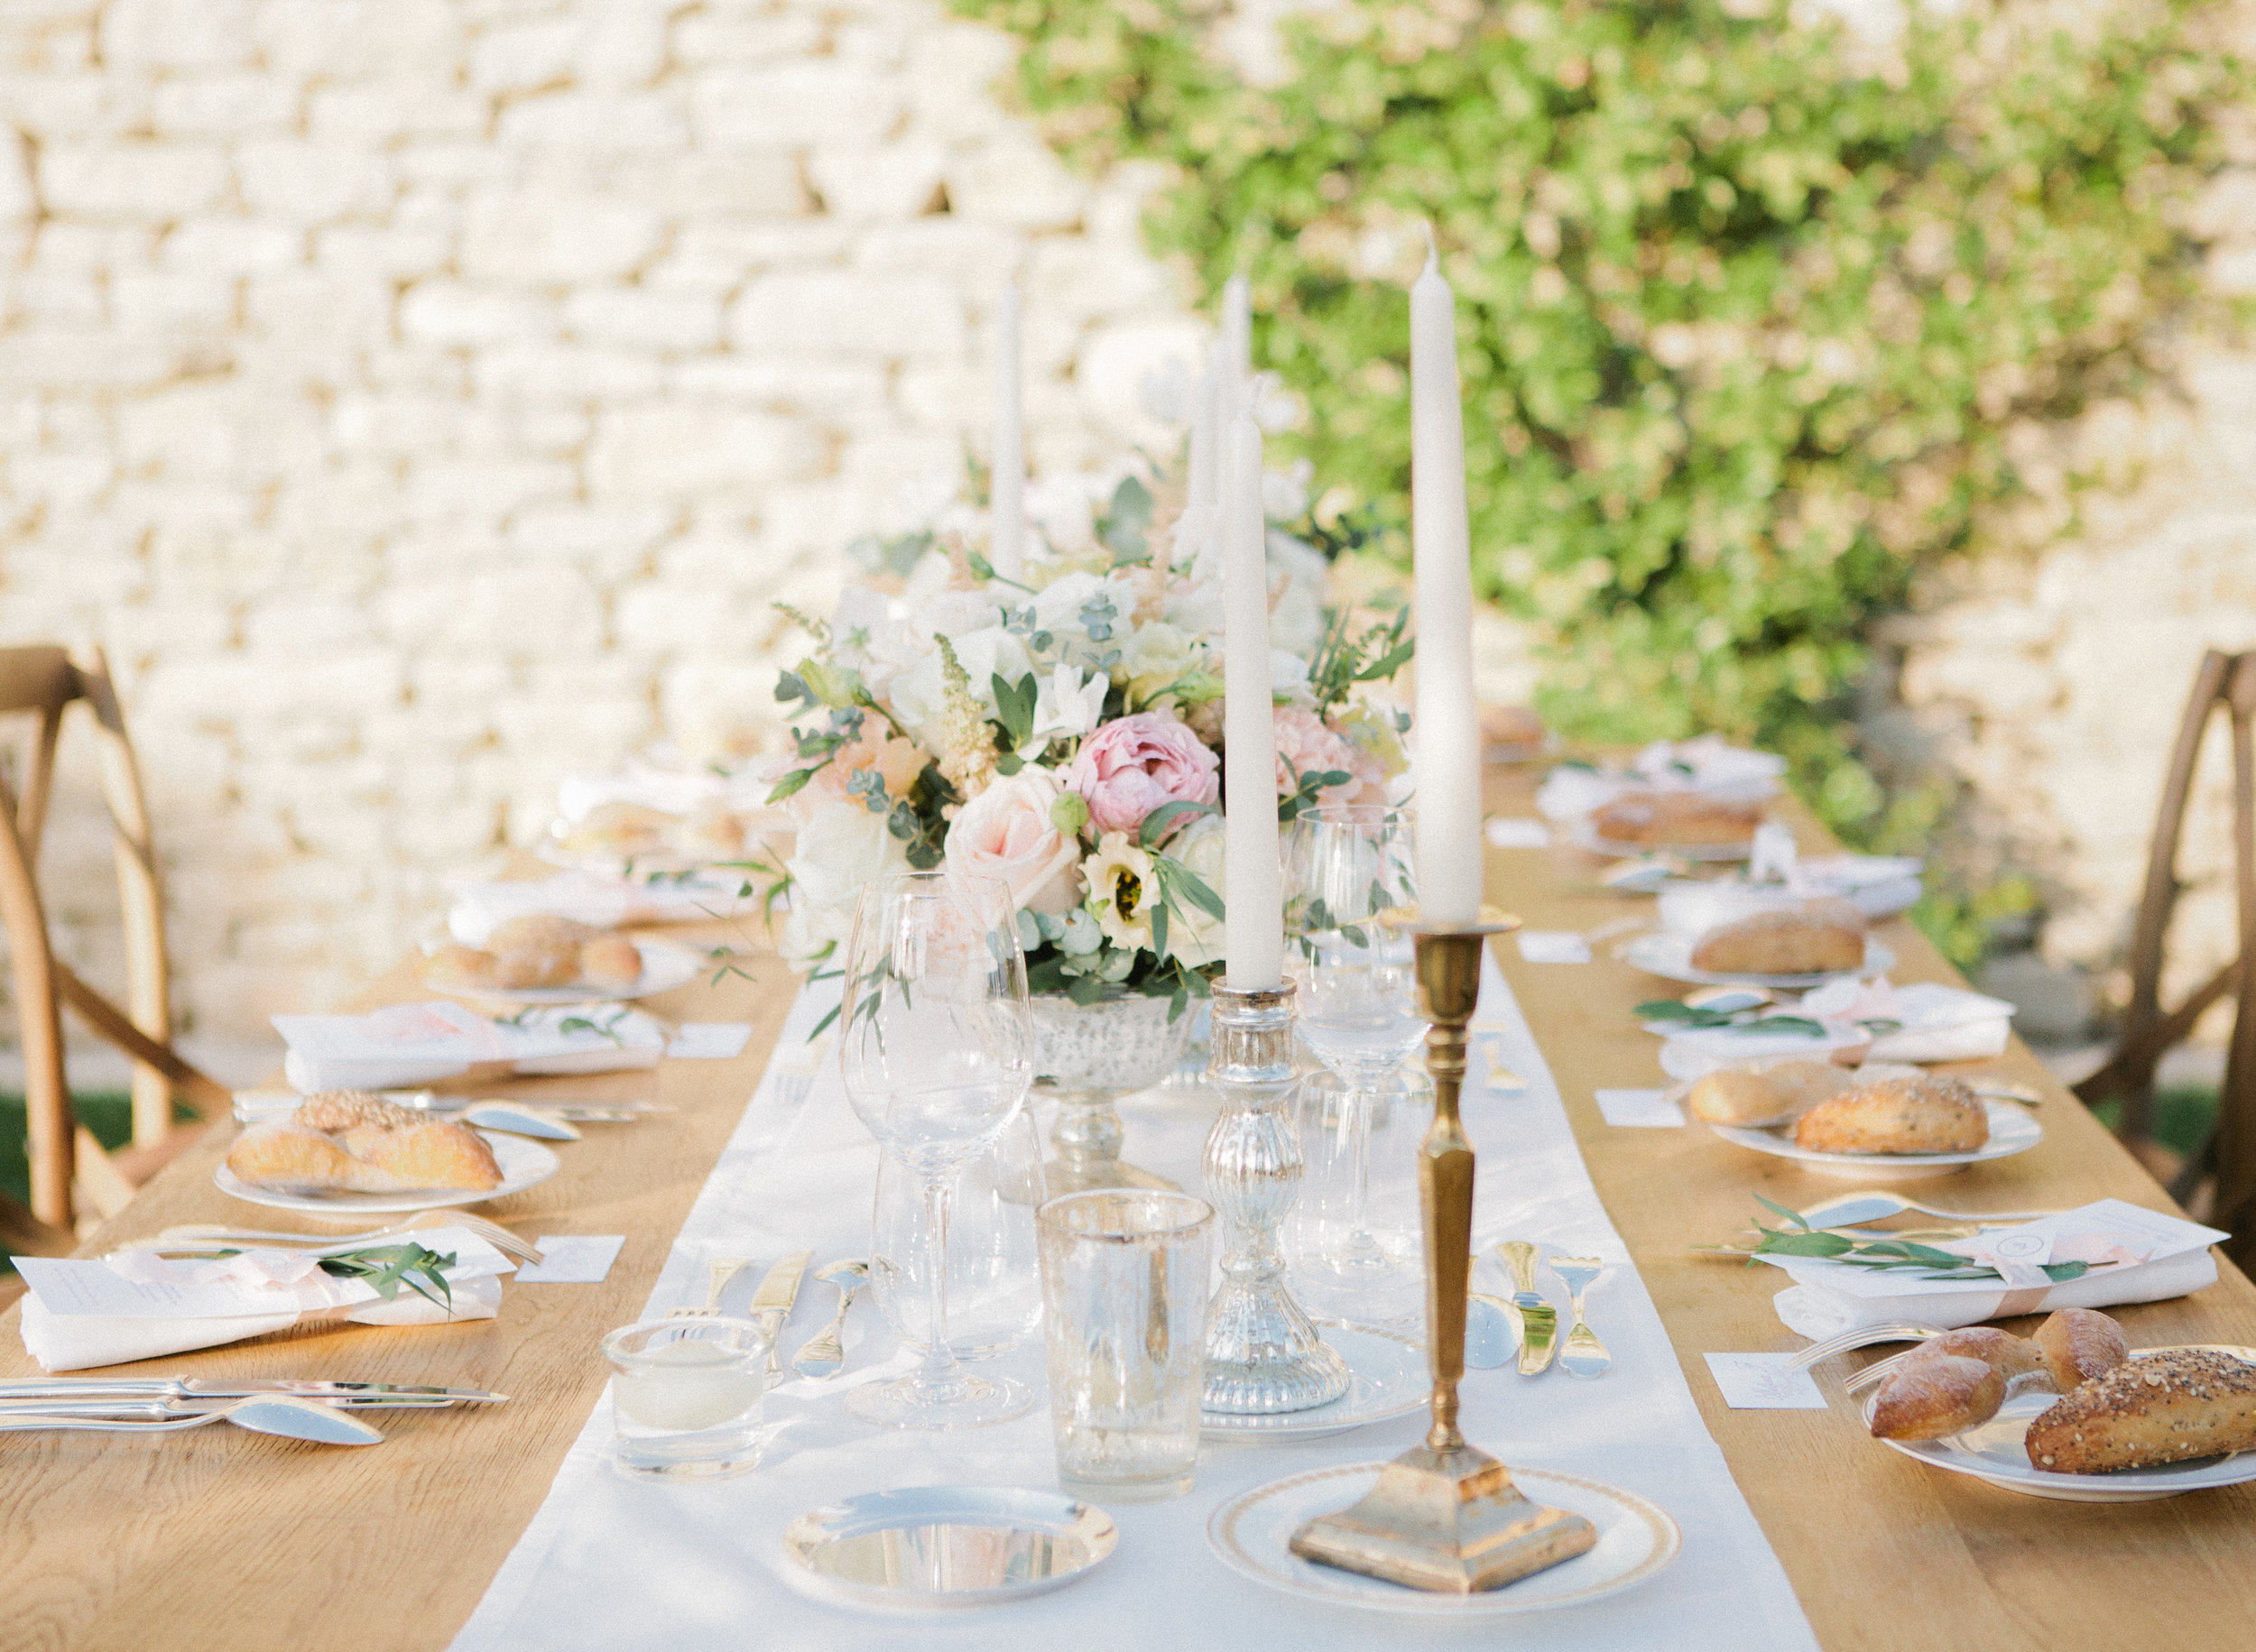 provence-wedding-rory-wylie.jpg-84.jpg